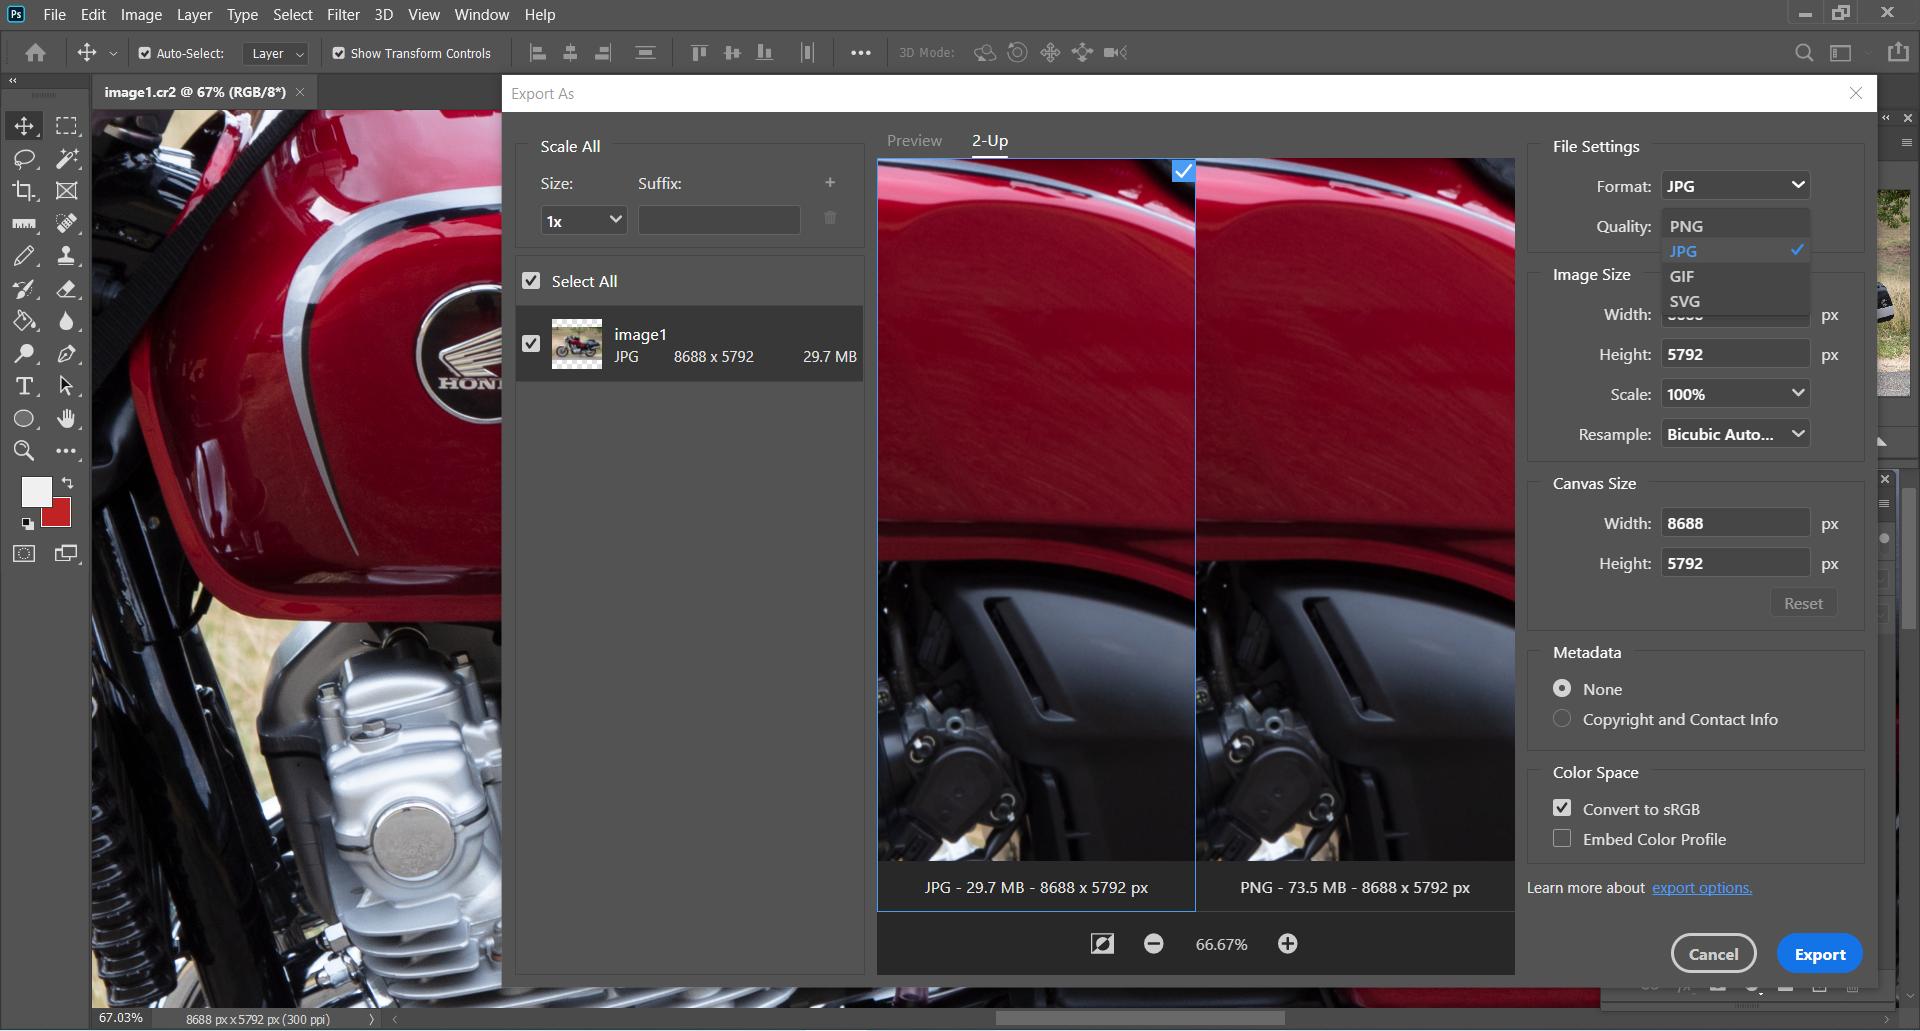 Is the best RAW converter Adobe Photoshop?